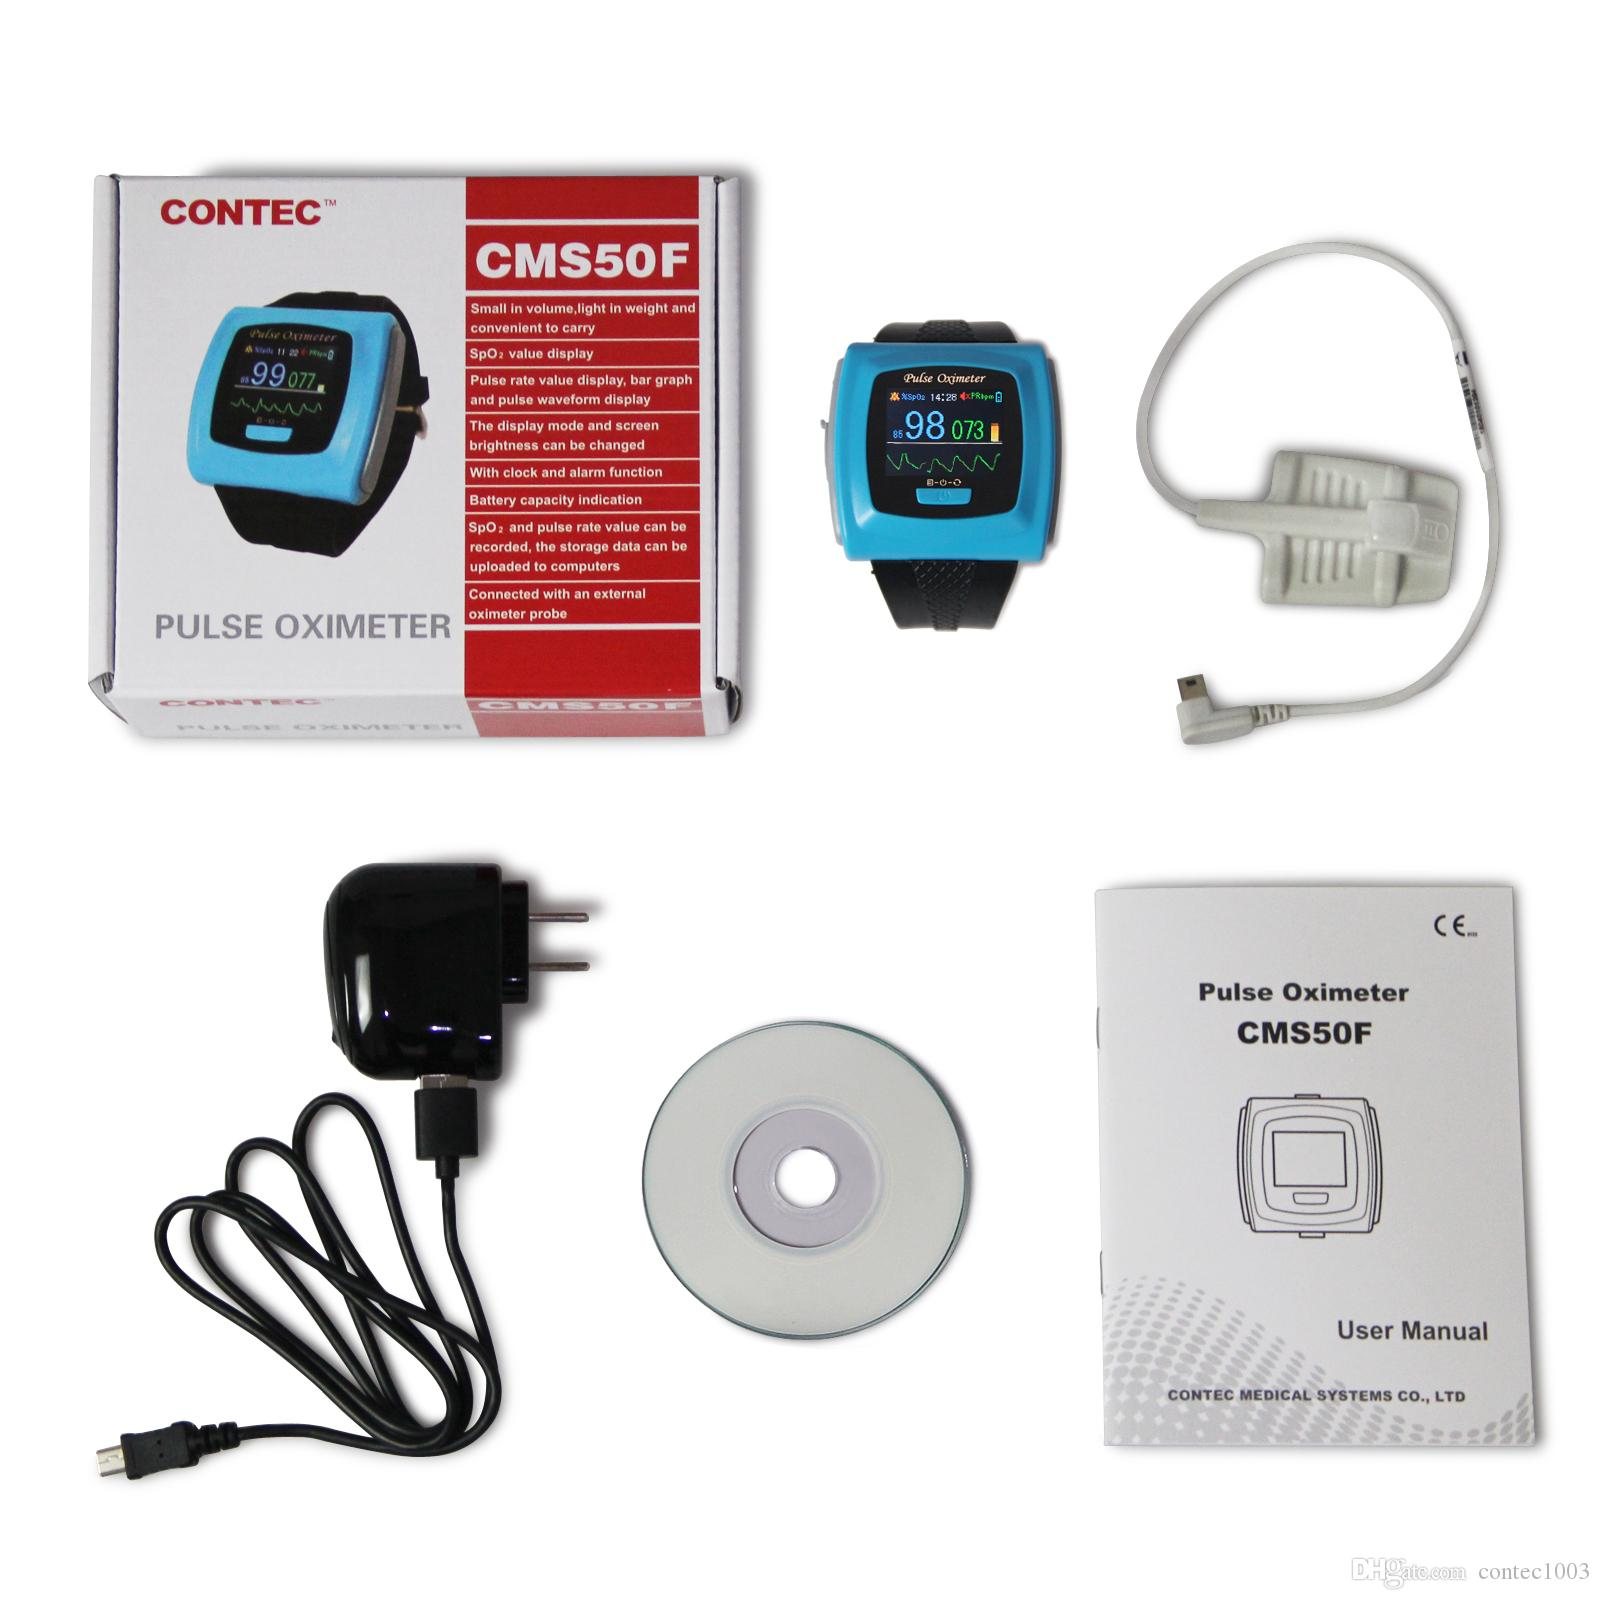 Best Pulse Oximeter For Overnight Monitoring